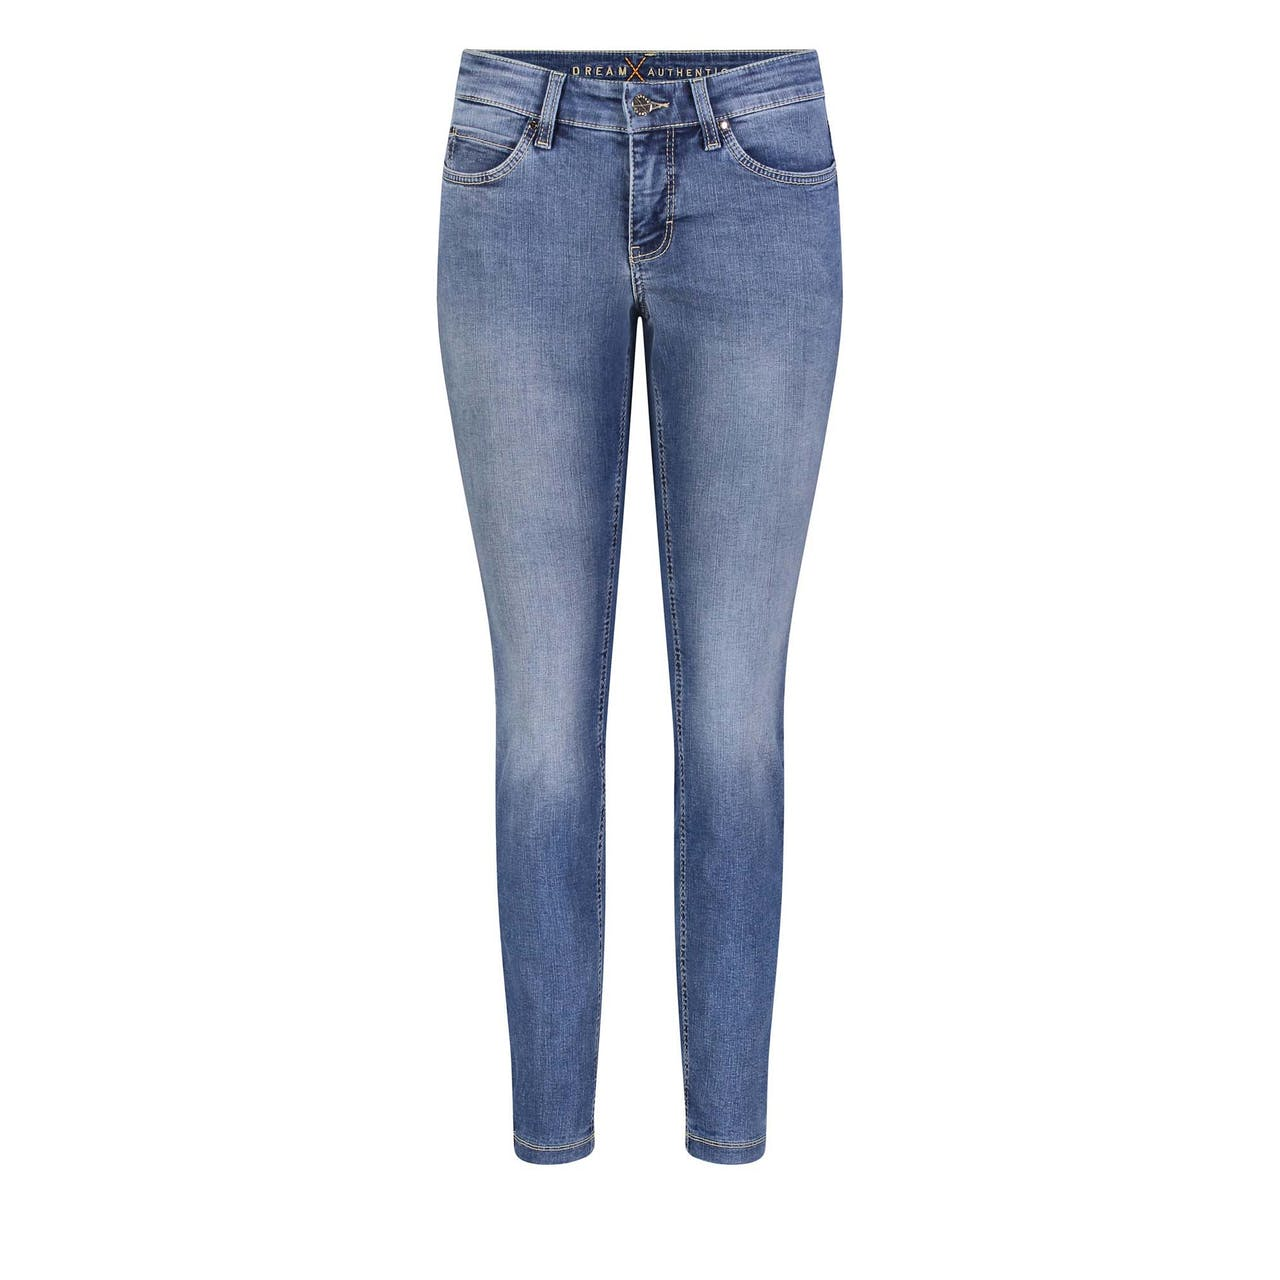 Jeans - DREAM SKINNY - 5 Pocket